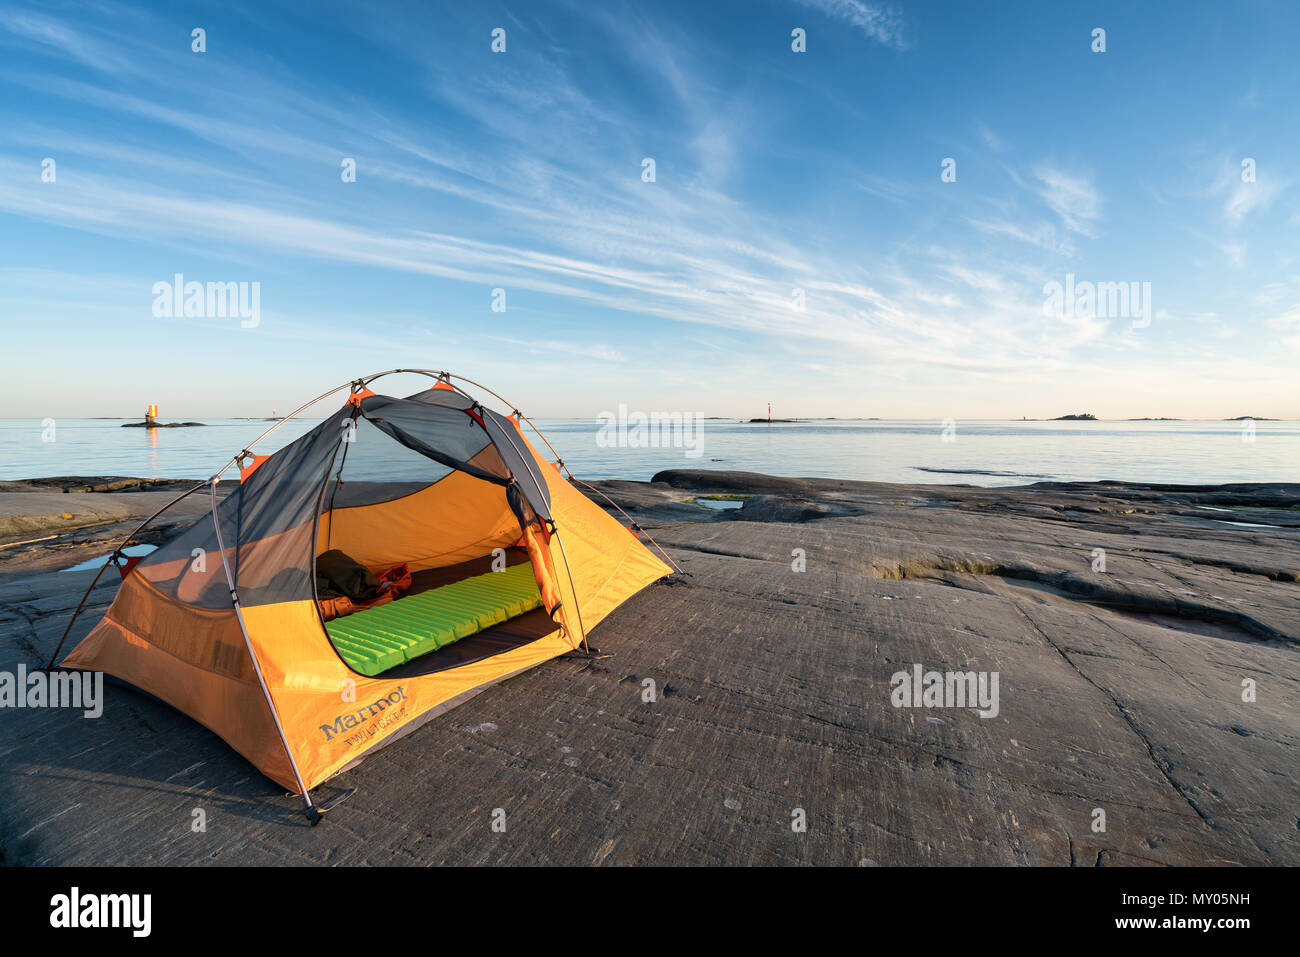 Camping at Glosholm island, Porvoo archipelago, Finland, Europe, EU - Stock Image